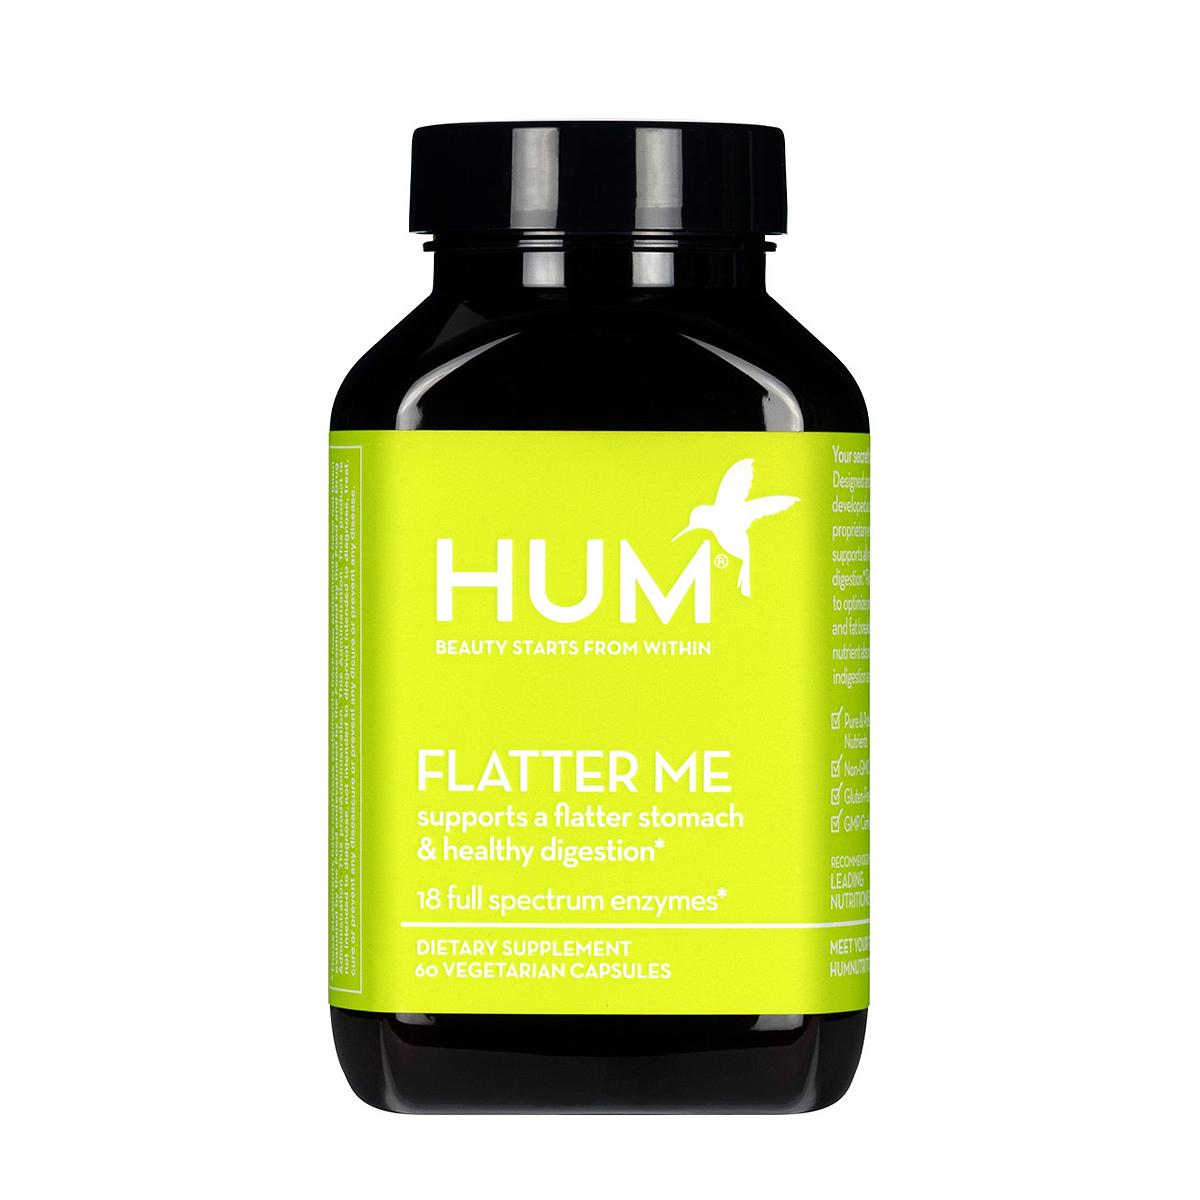 hum-flatter-me-bloat-supplement